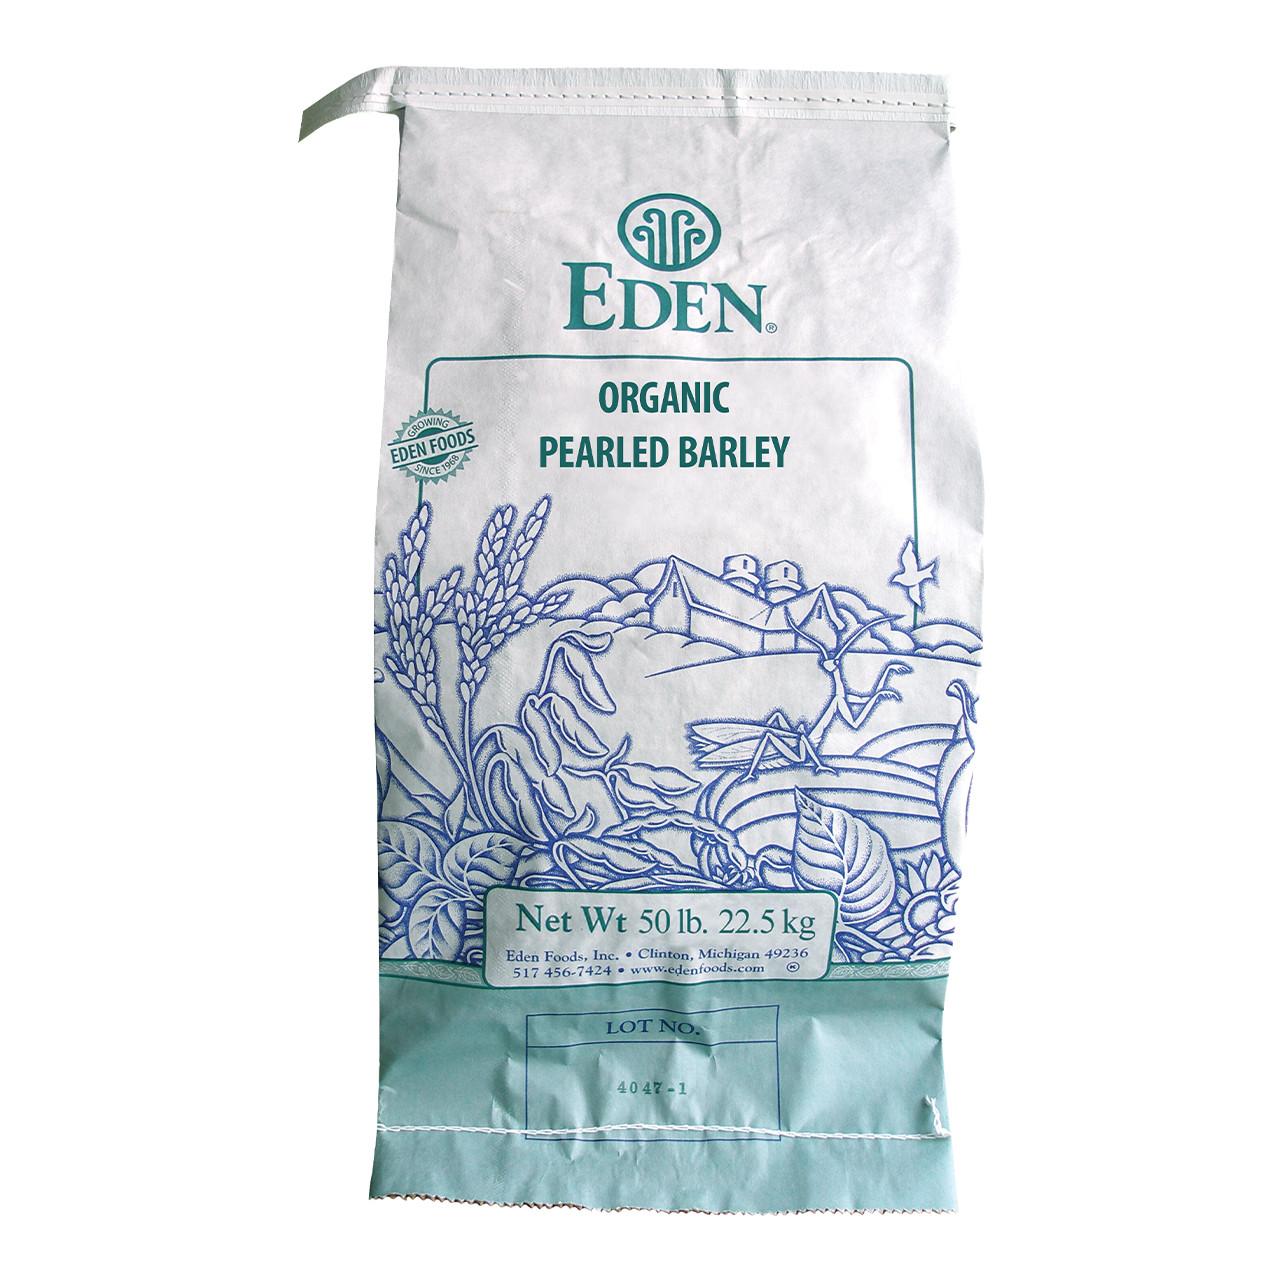 Pearled Barley, Organic - 50 lb